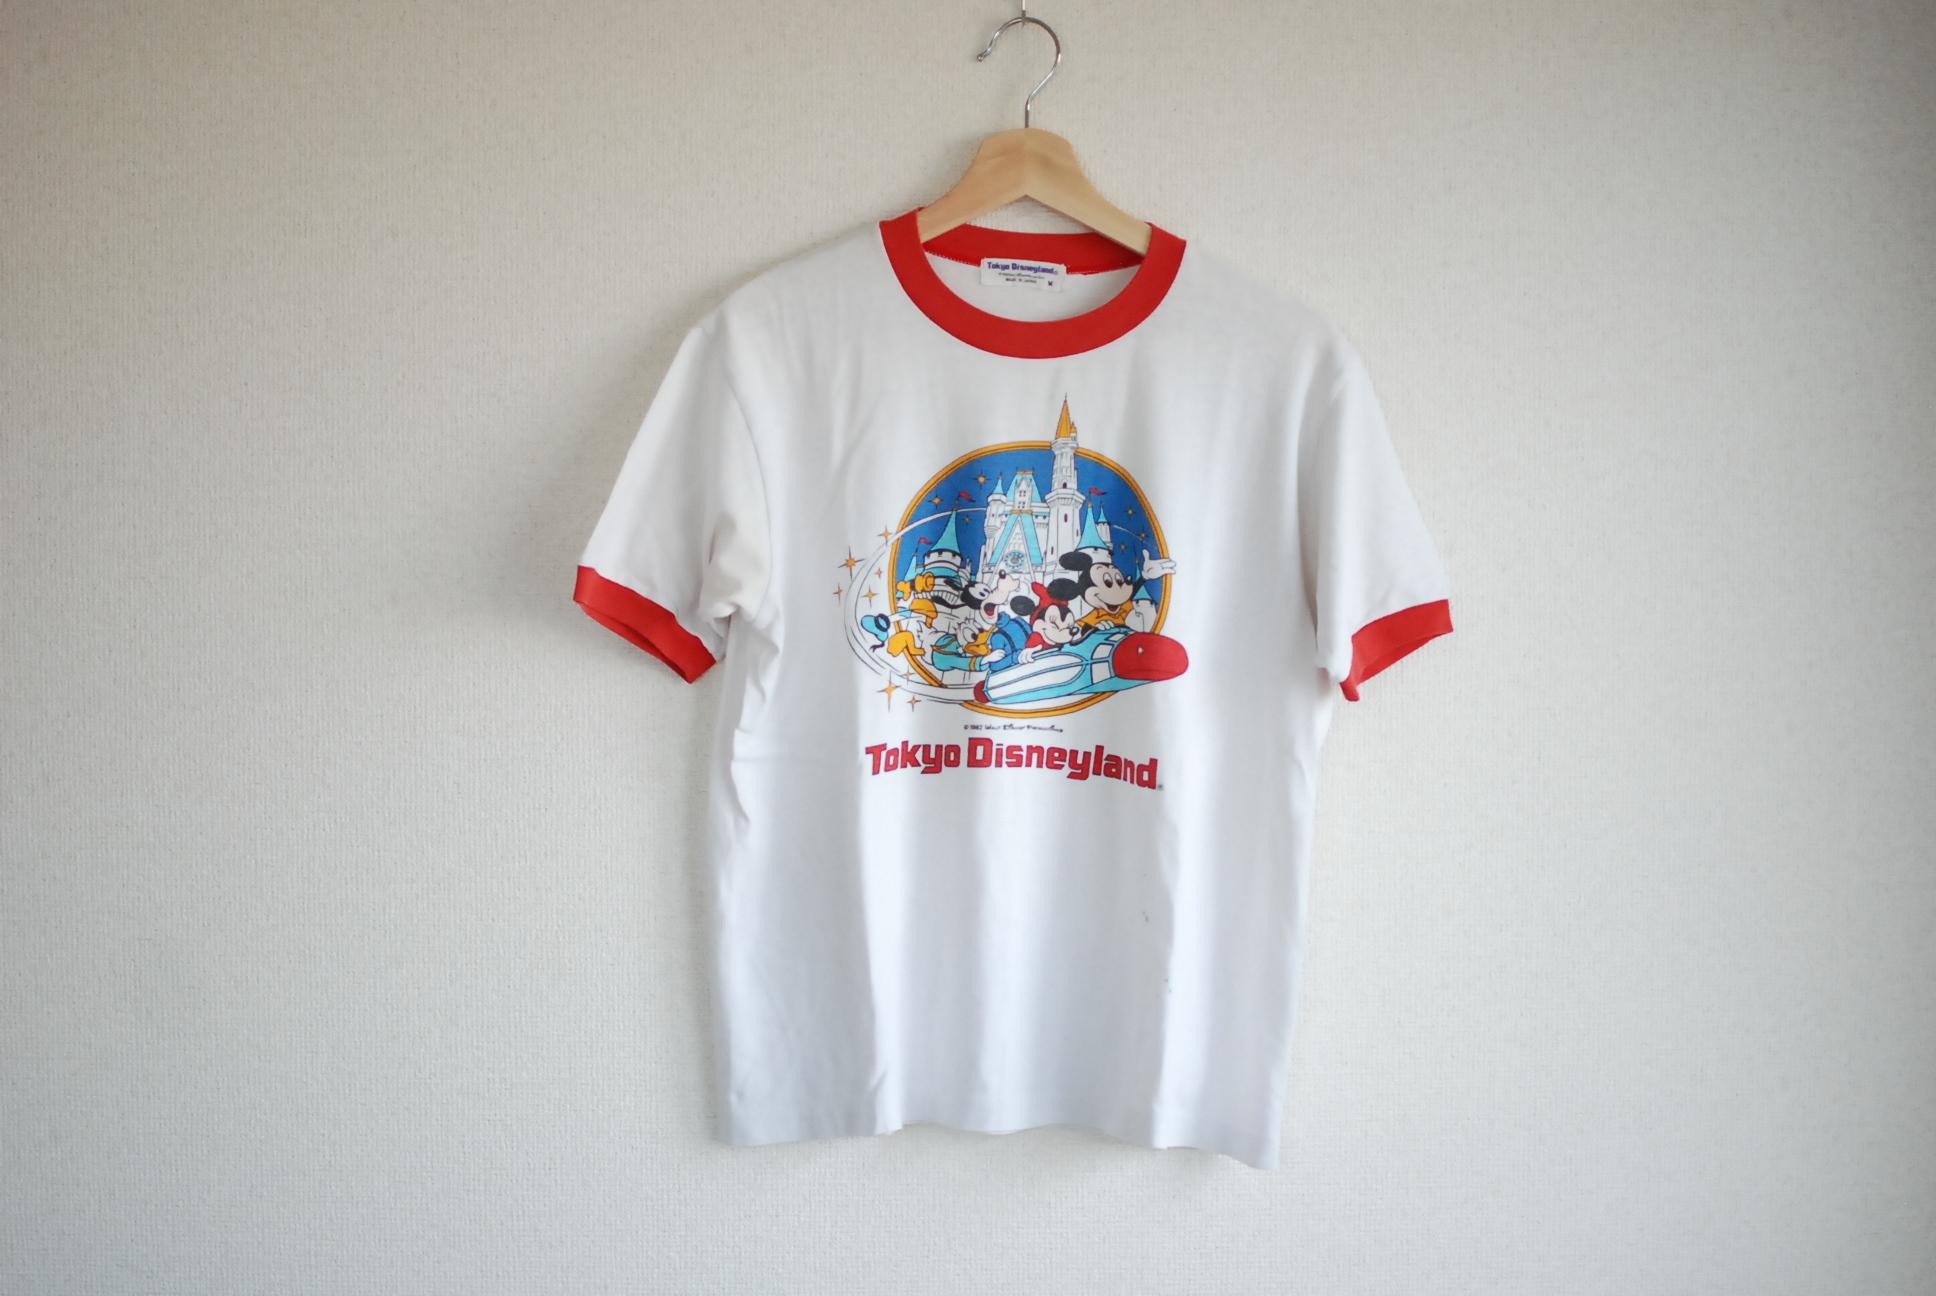 【UNISEX】VINTAGE 1982 TOKYO DISNEY LAND Ringer T-shirt